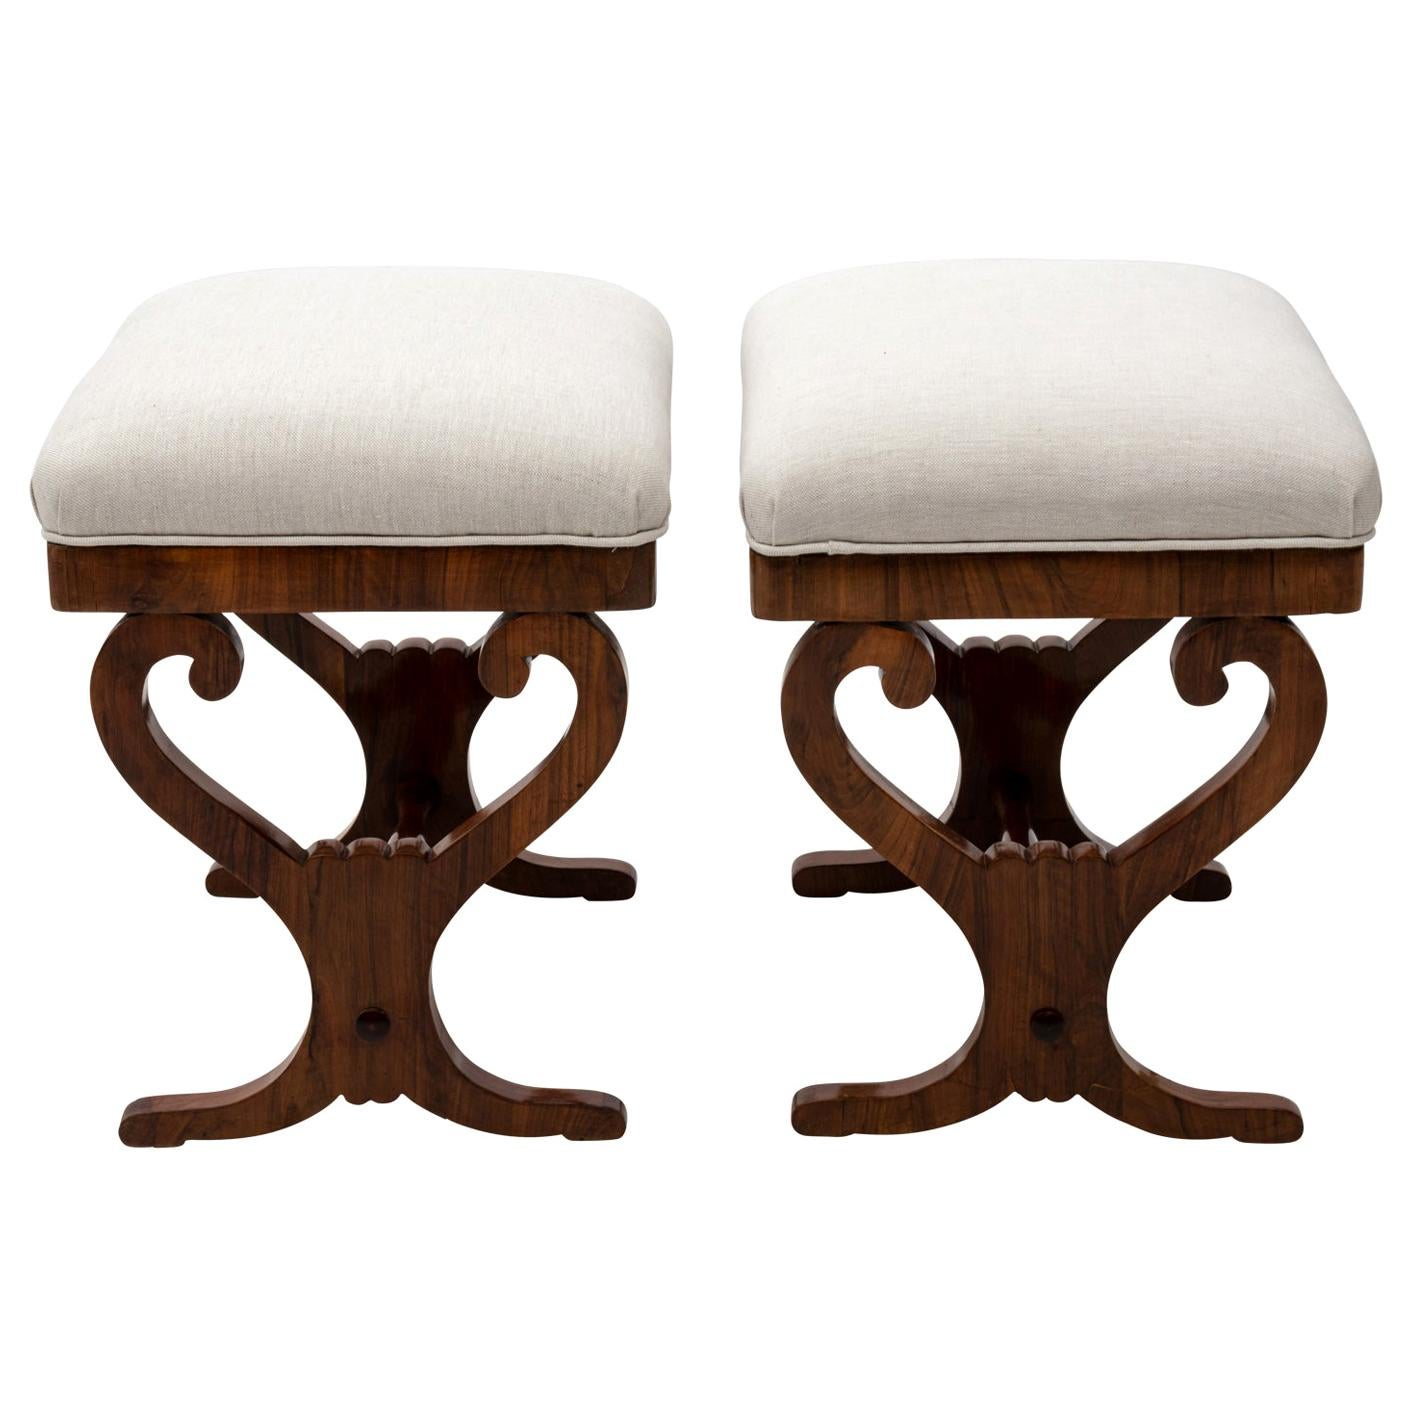 Pair of Biedermeier Upholstered Benches